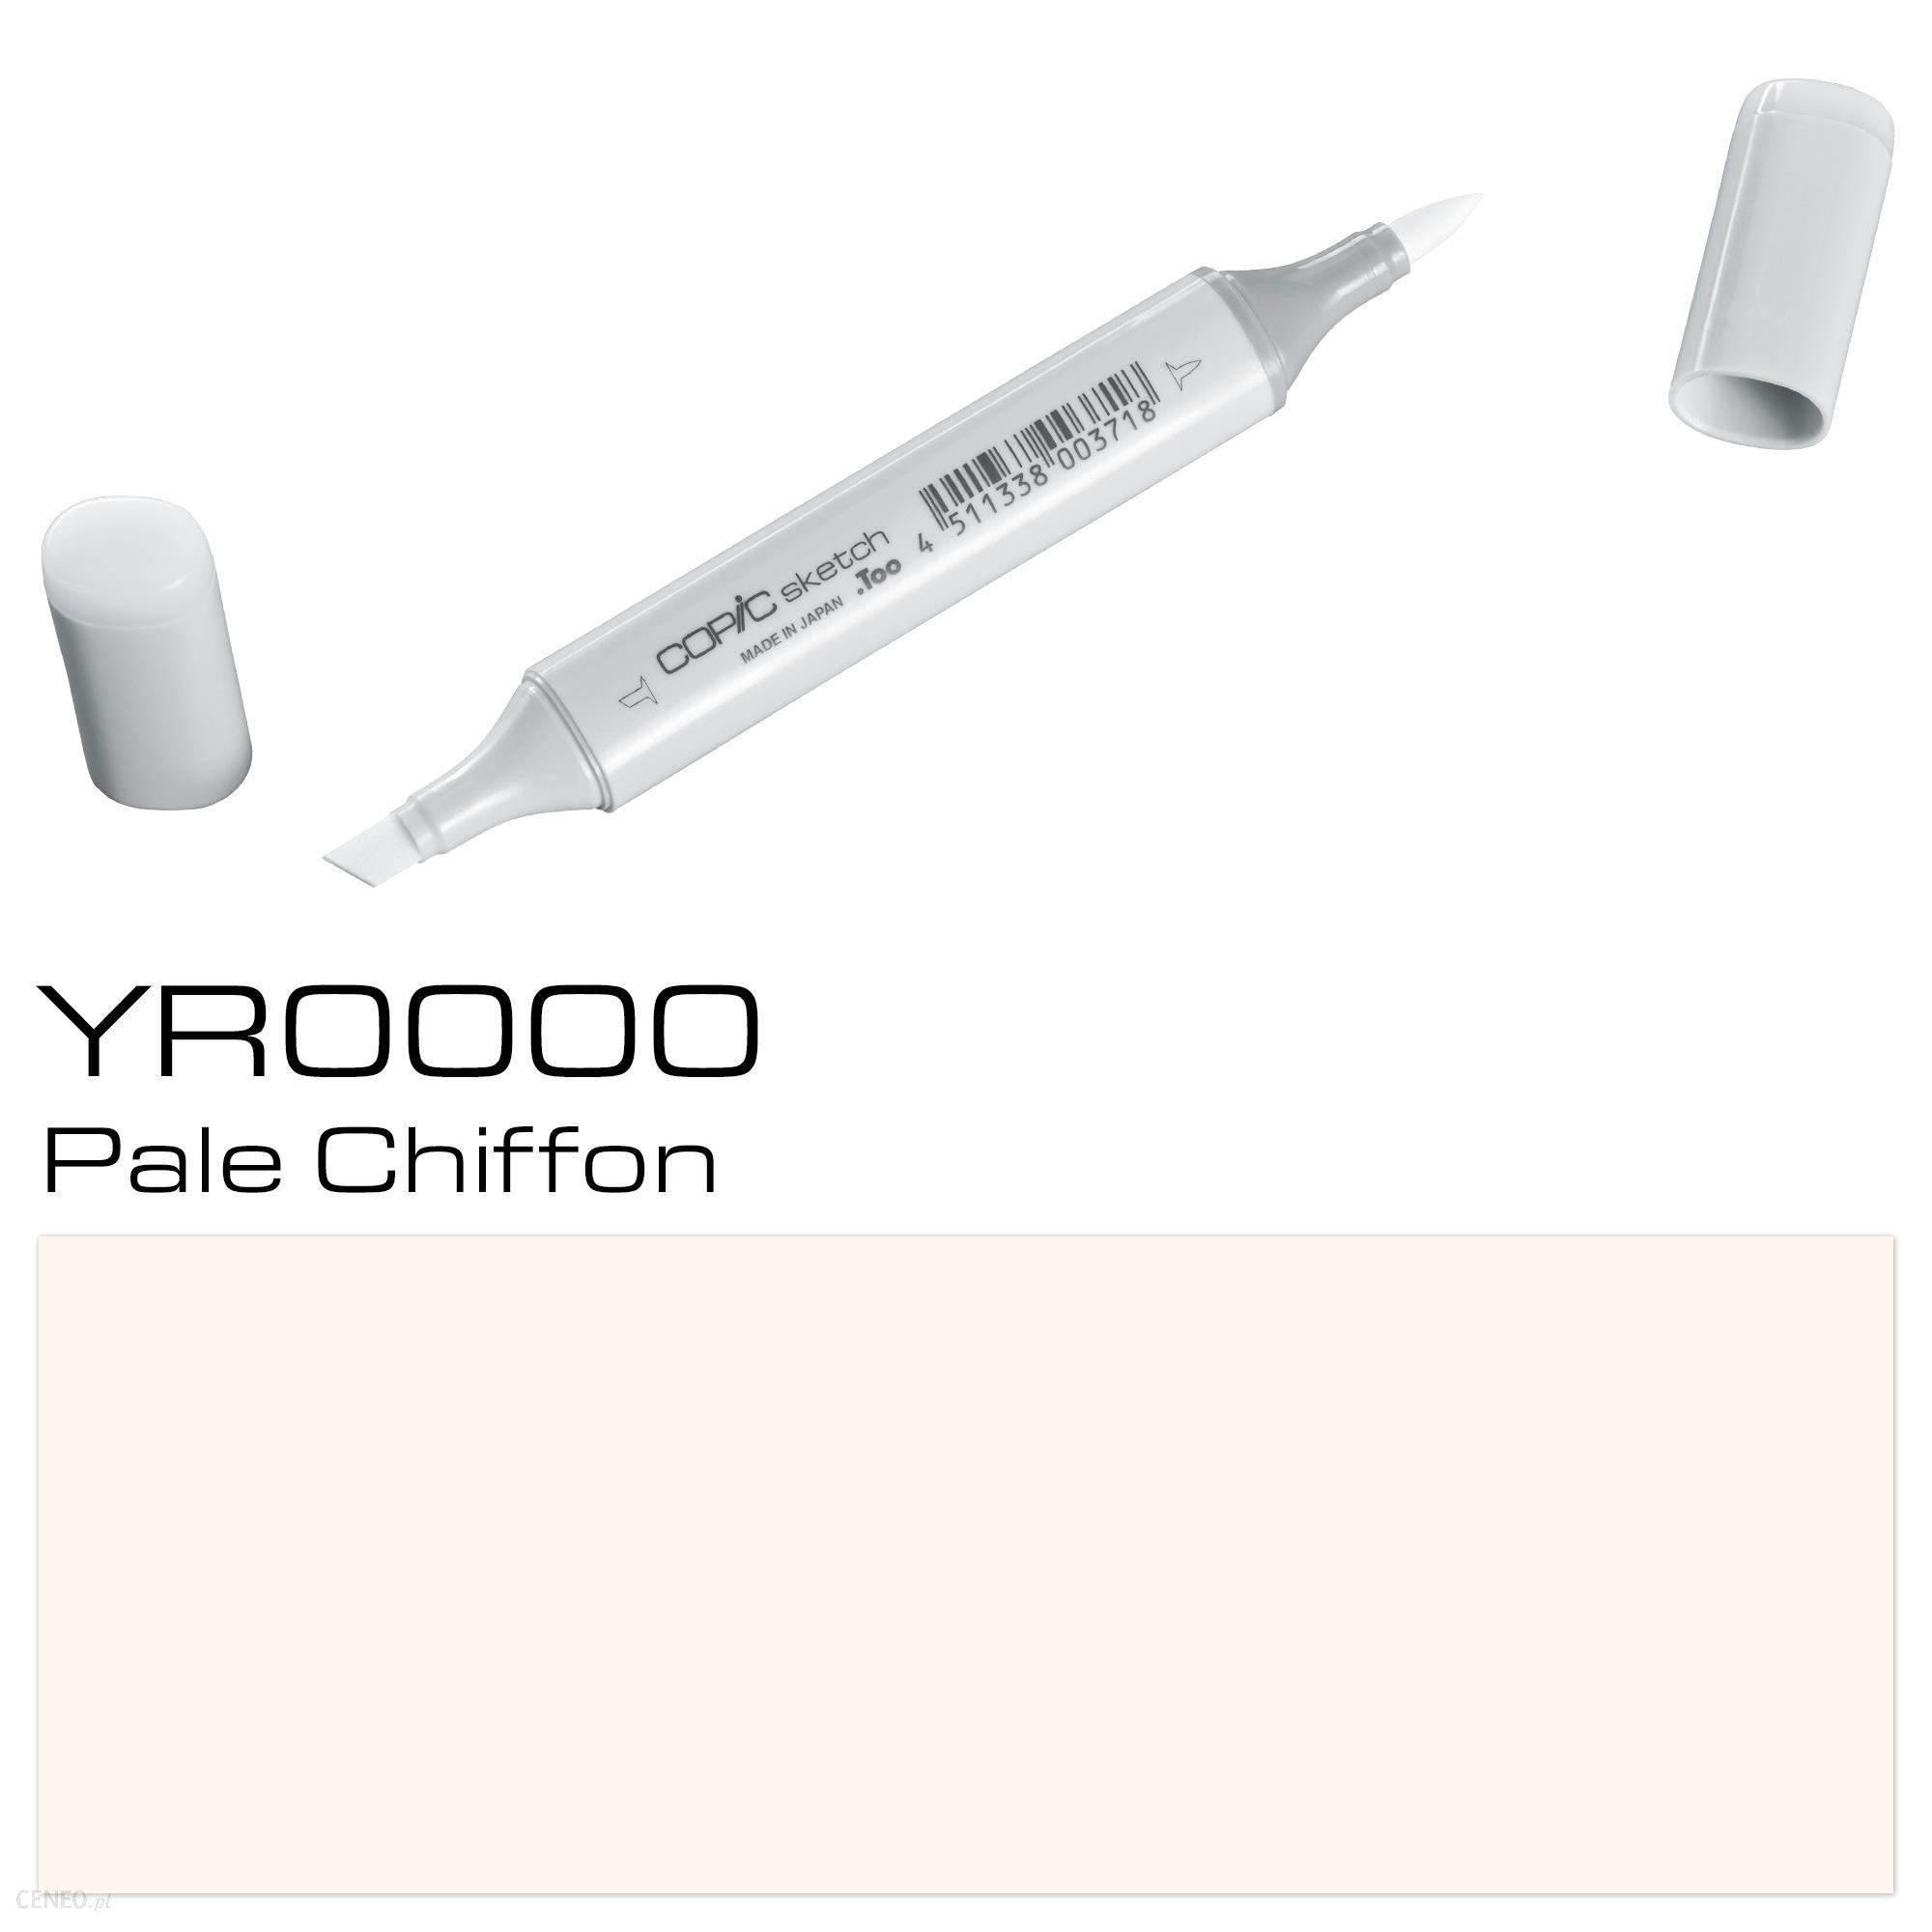 COPIC Sketch - YR0000 - Pale Chiffon